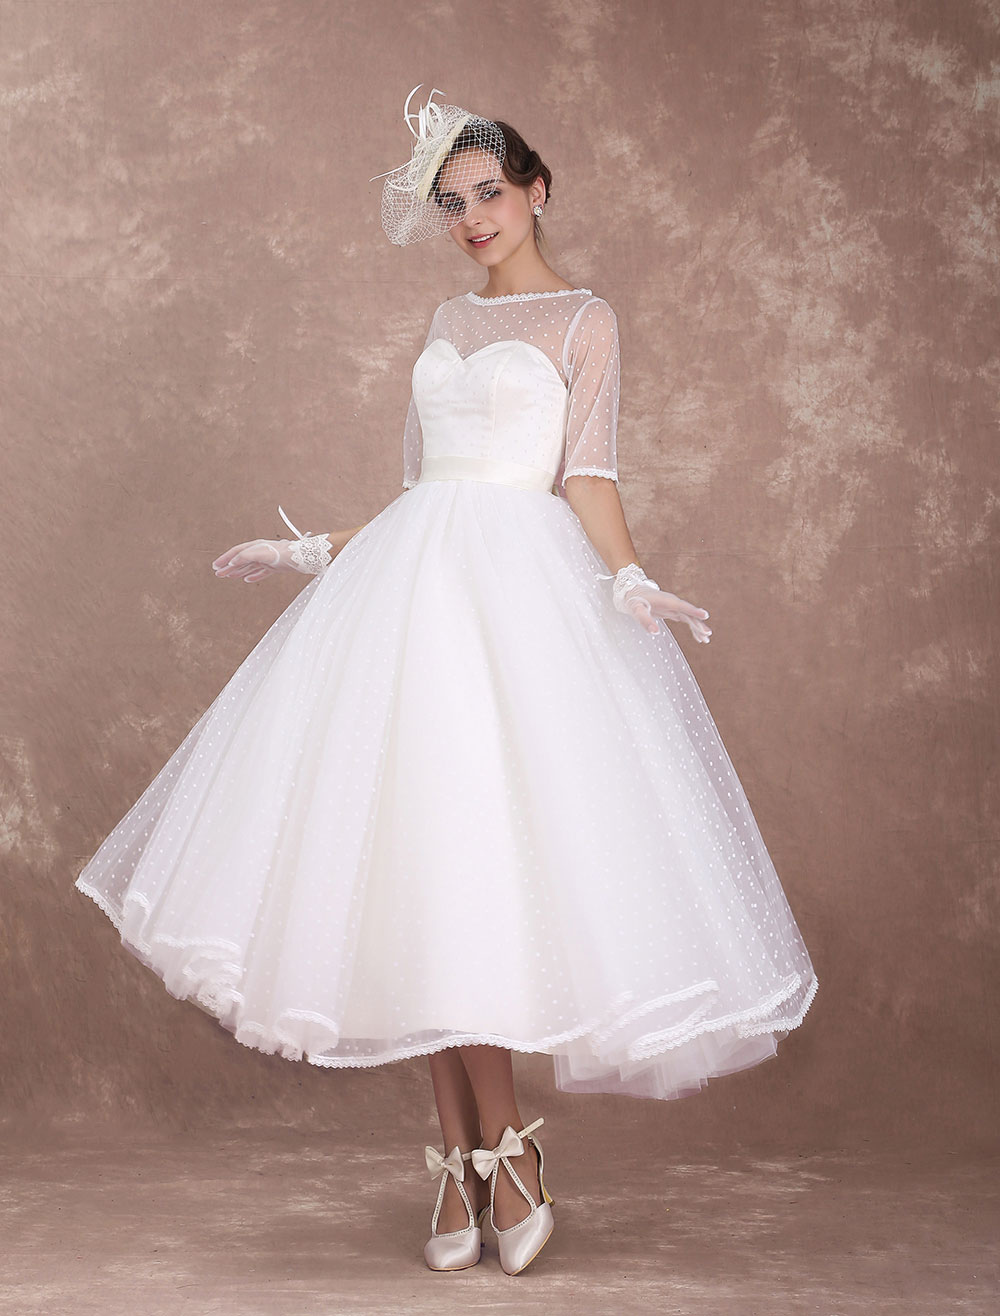 Vintage Wedding Dress 1950's Short Bridal Dress Ivory Backless Polka Dot Half Sleeve Sweetheart Bow Sash Weddig Reception Dress Milanoo